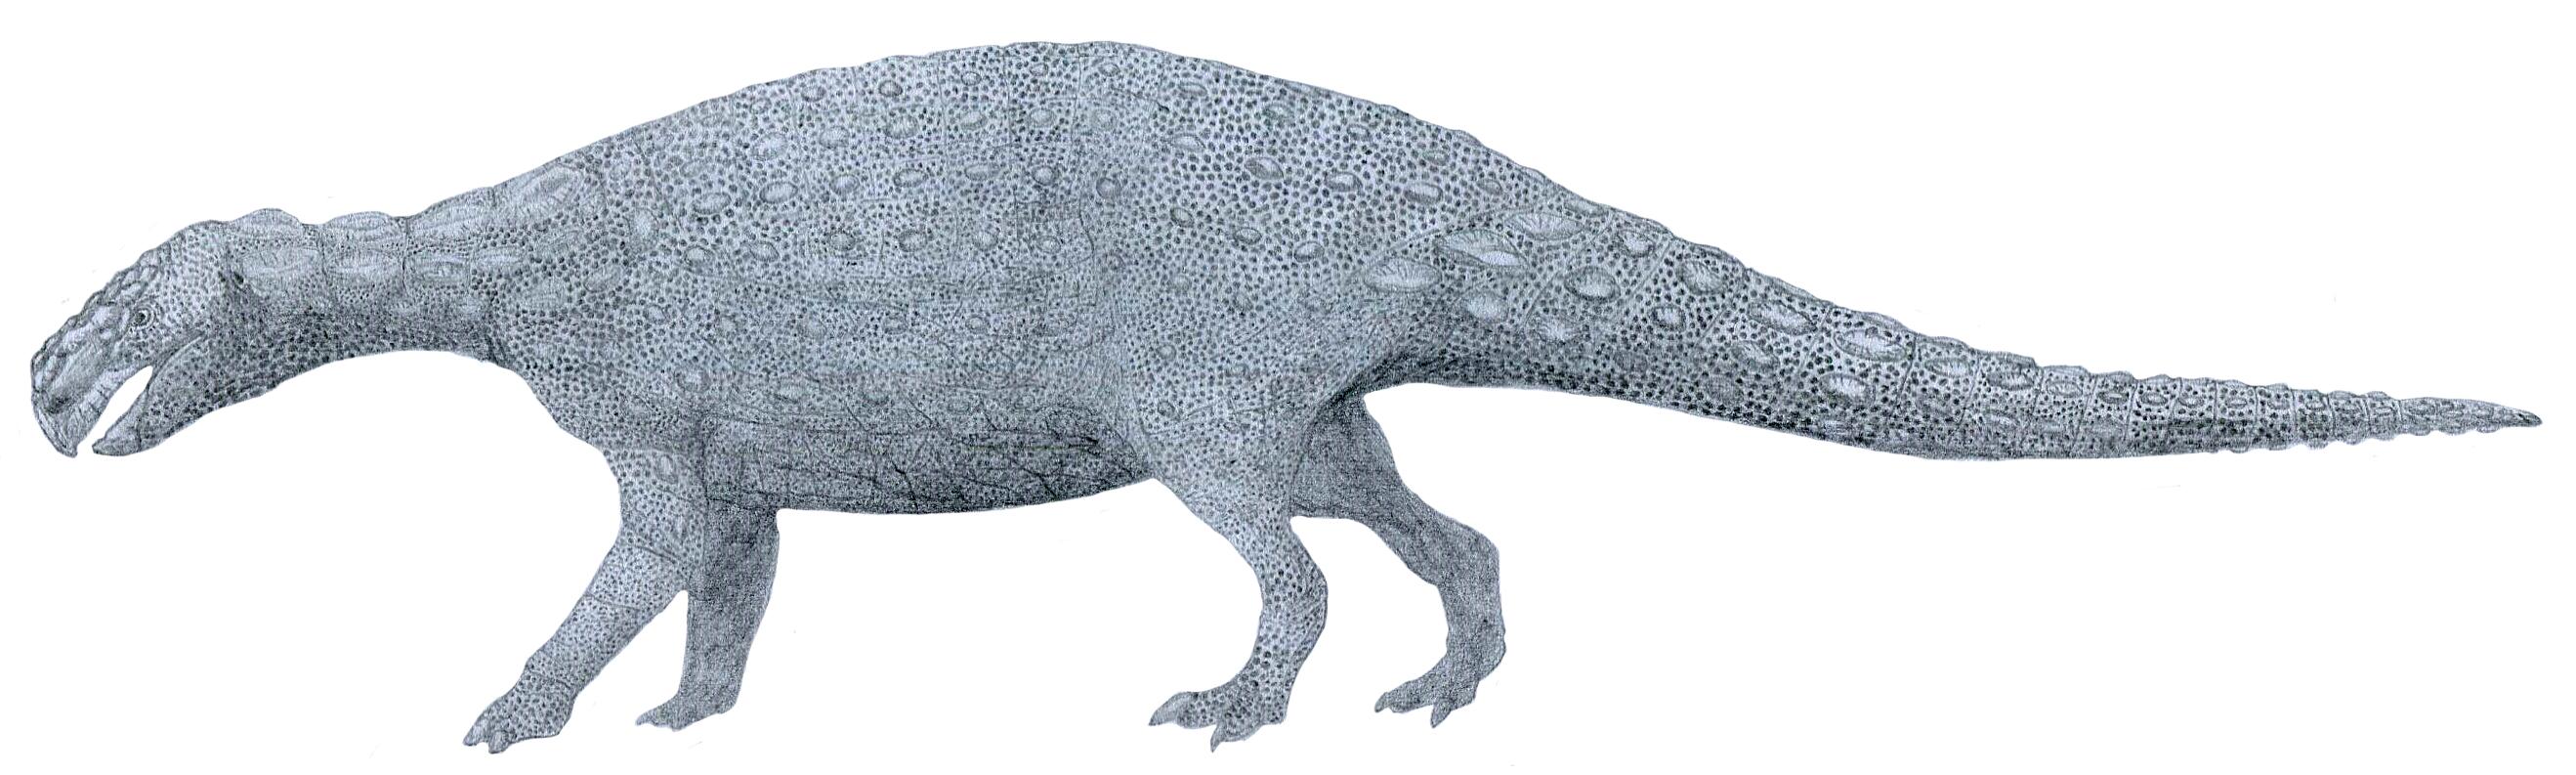 Ievers' Shield Saurian by Tomozaurus